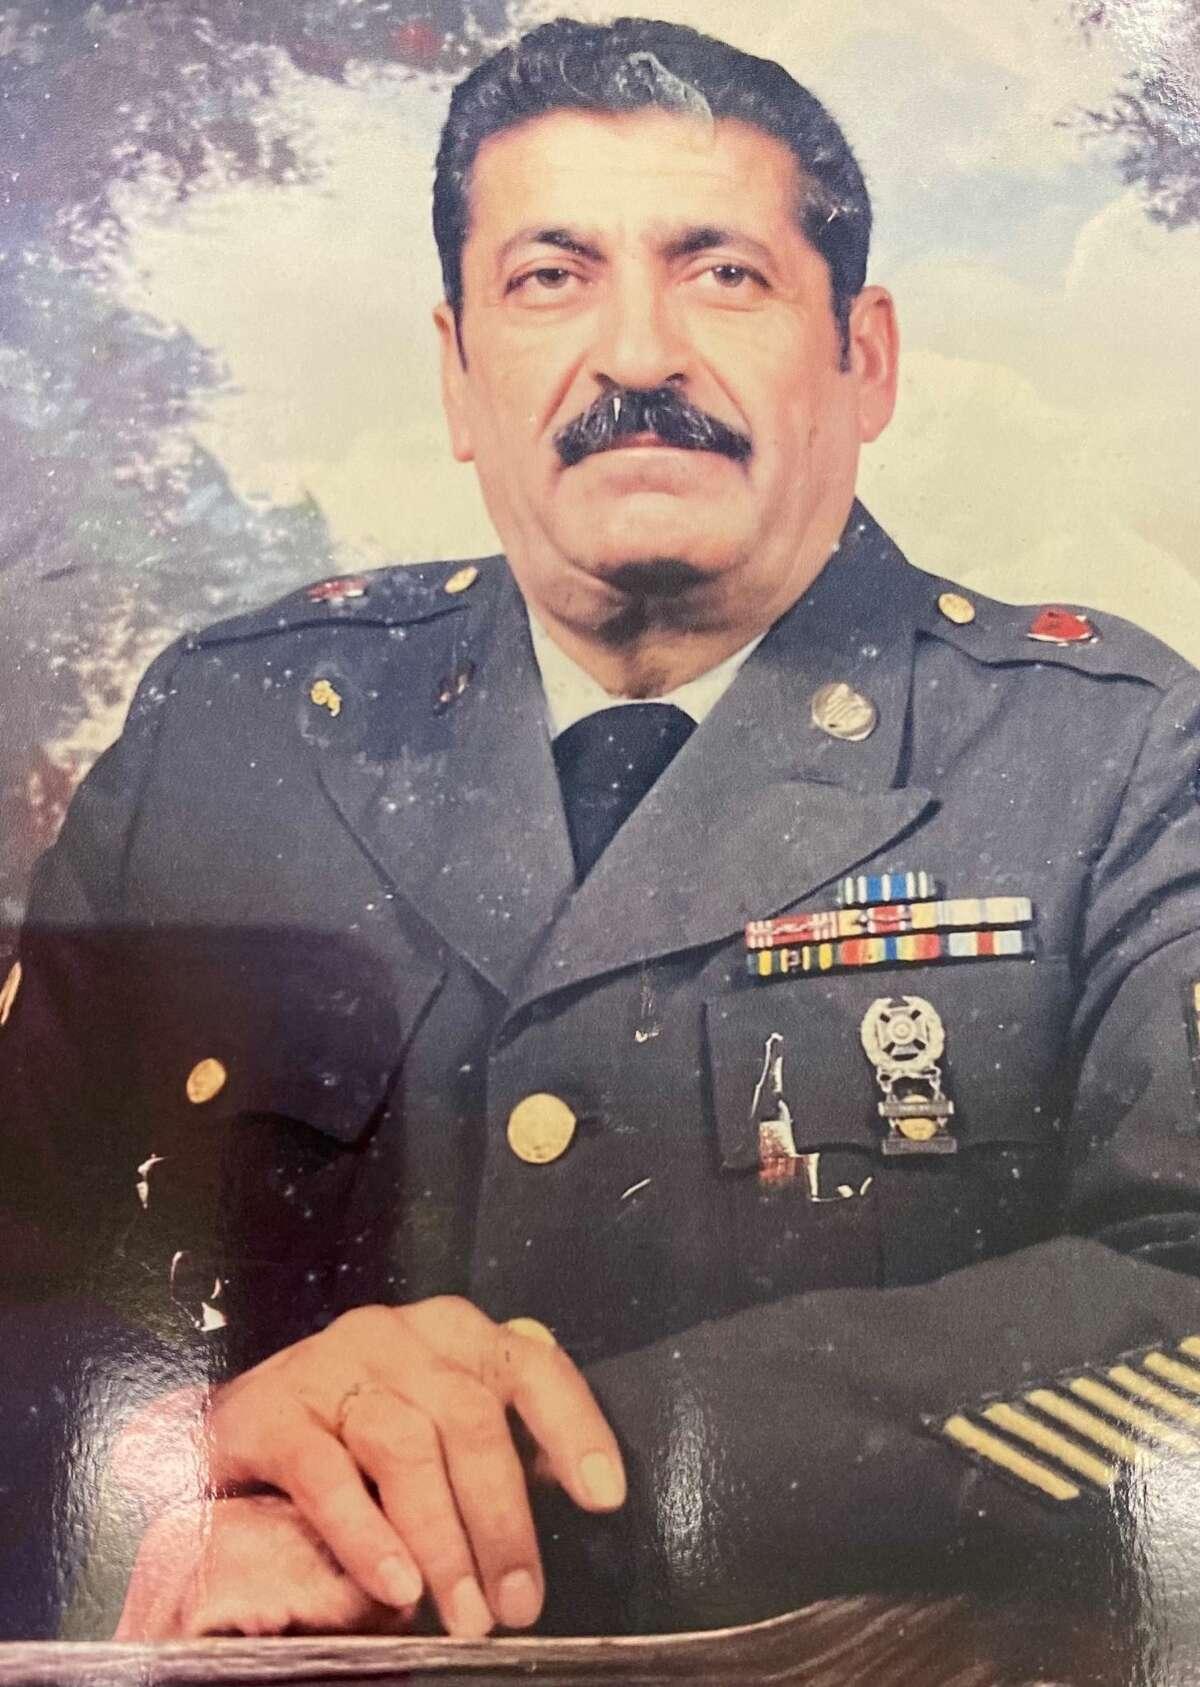 Luis 'Chino' Lopez